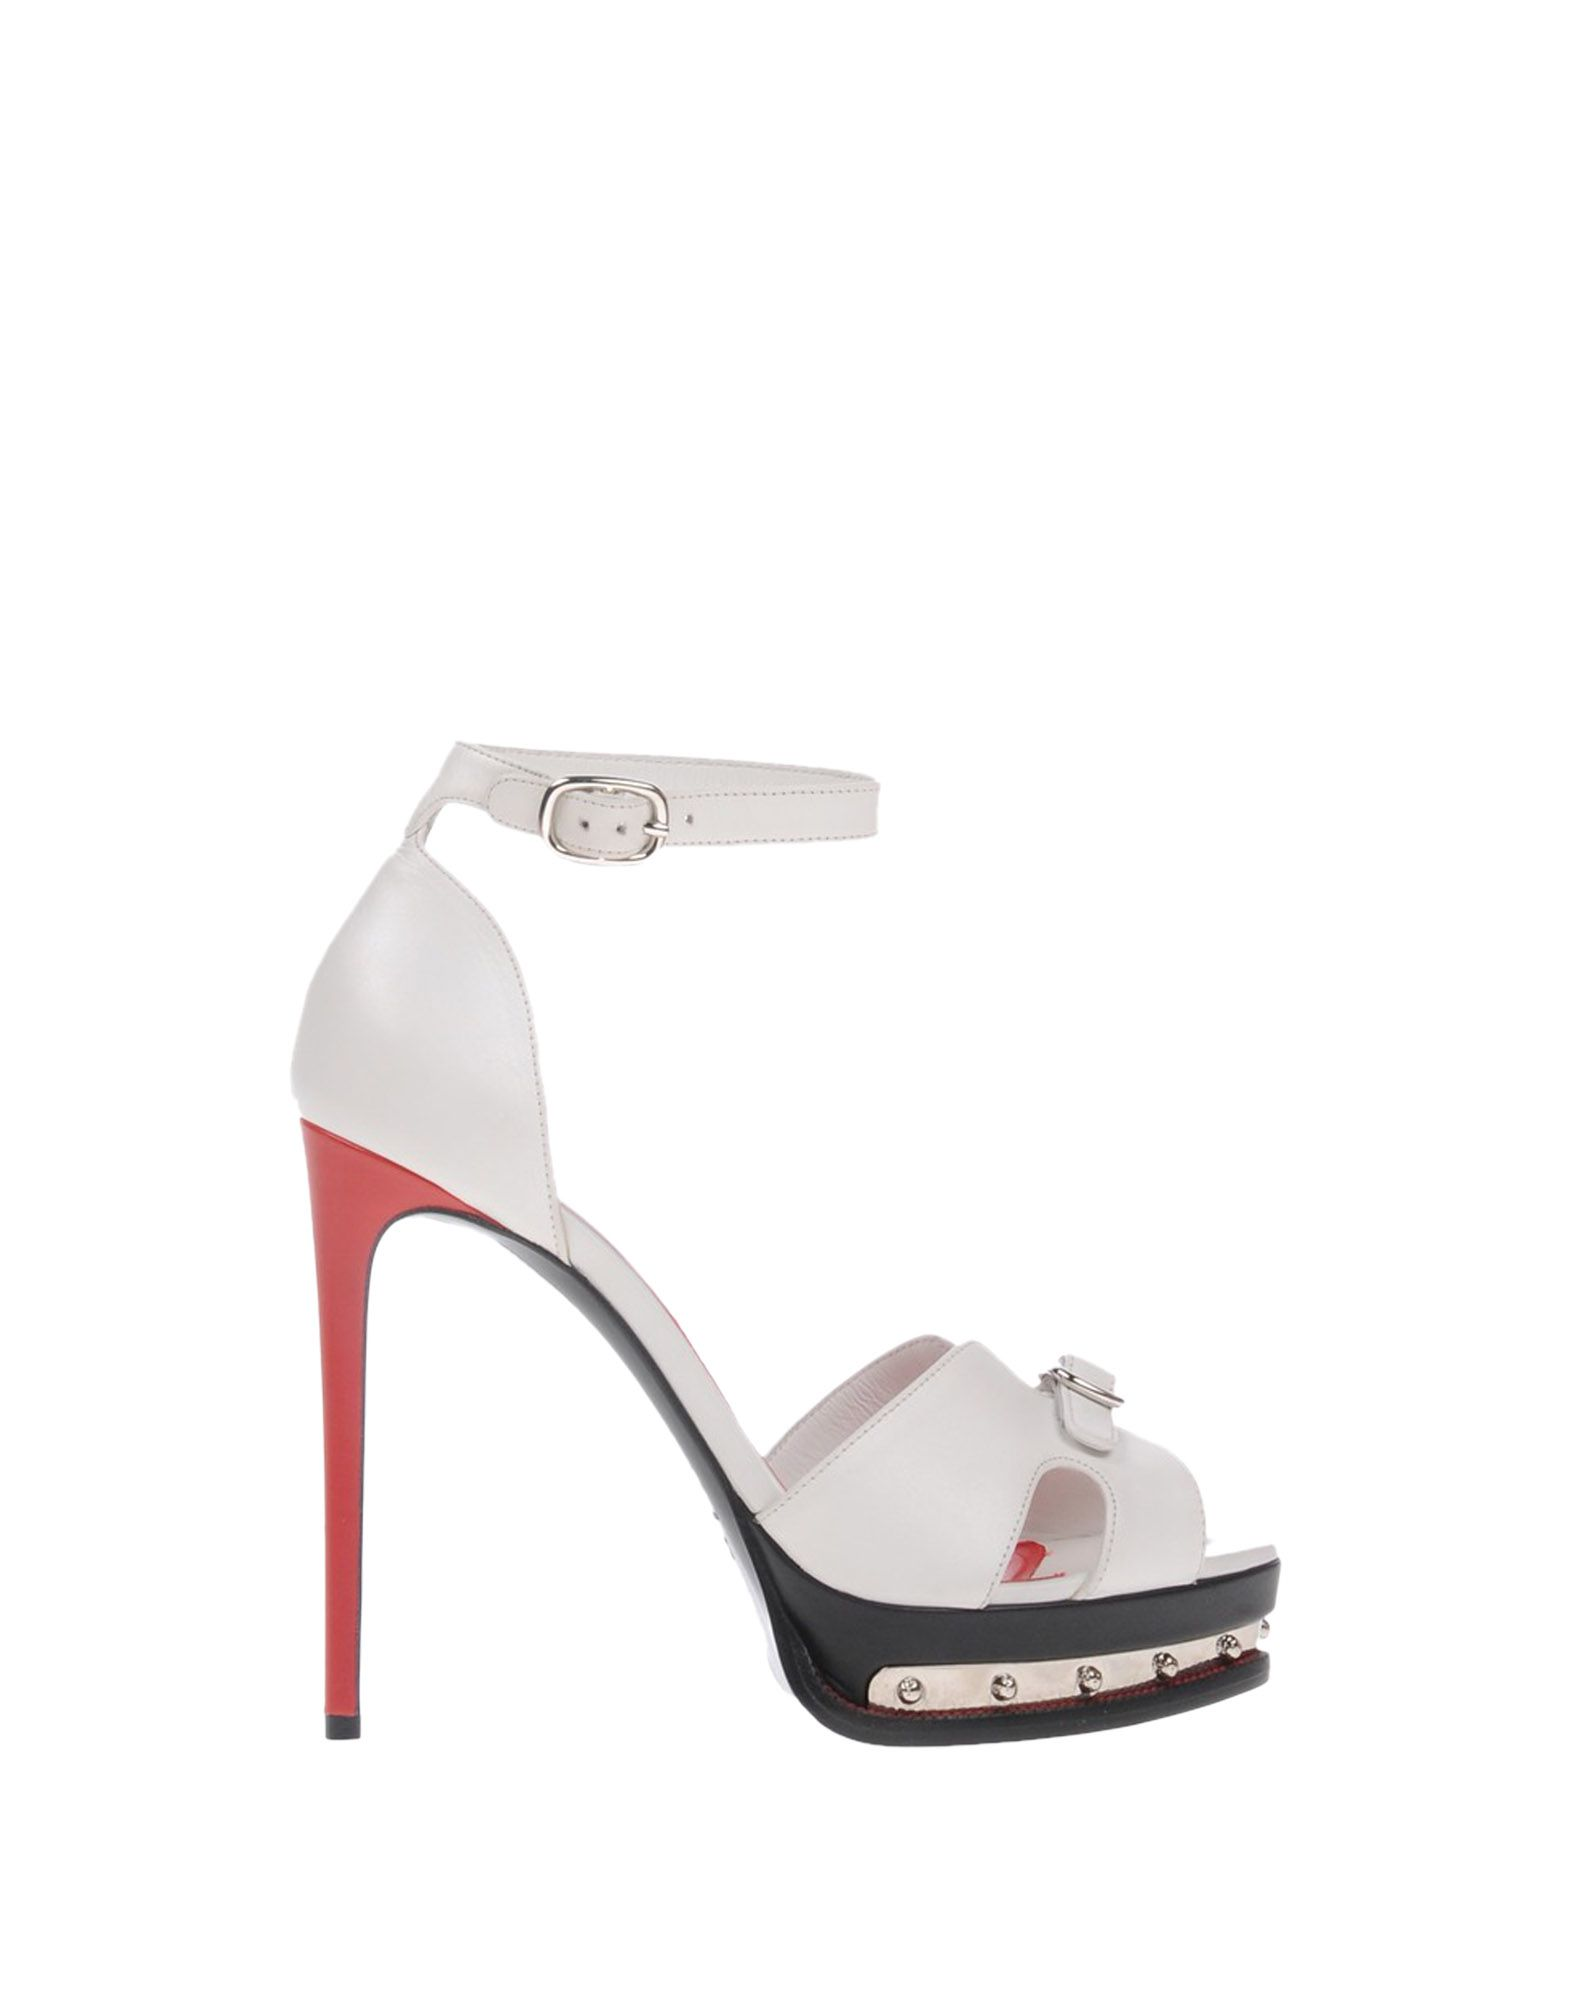 Alexander Mcqueen Sandalen aussehende Damen  11433036ELGünstige gut aussehende Sandalen Schuhe 79a8da